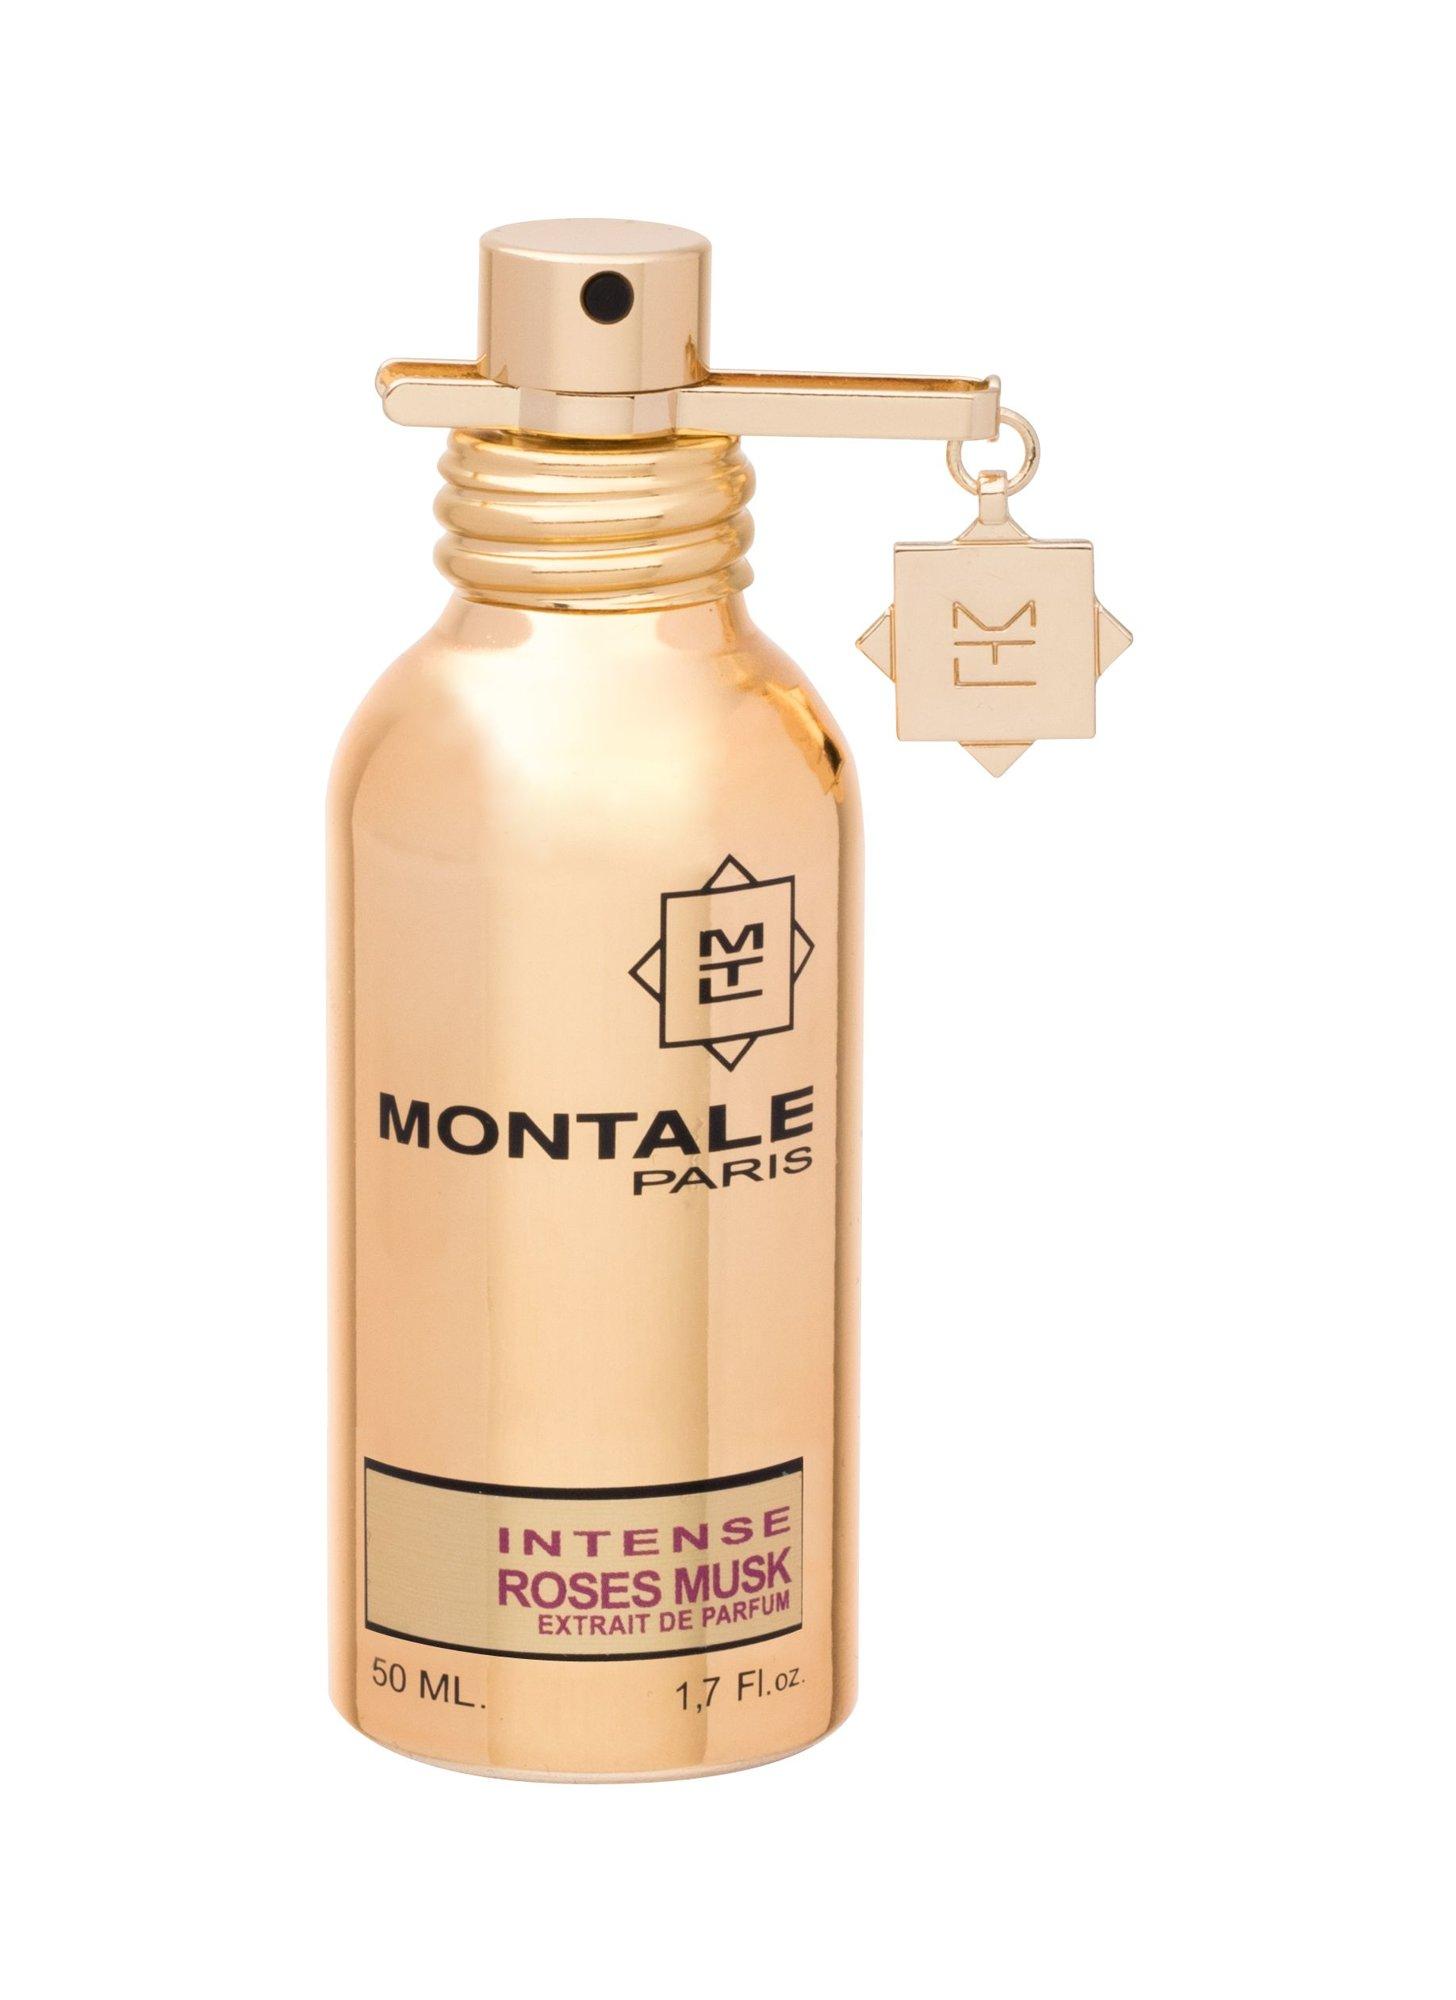 Montale Paris Intense Roses Musk EDP 50ml